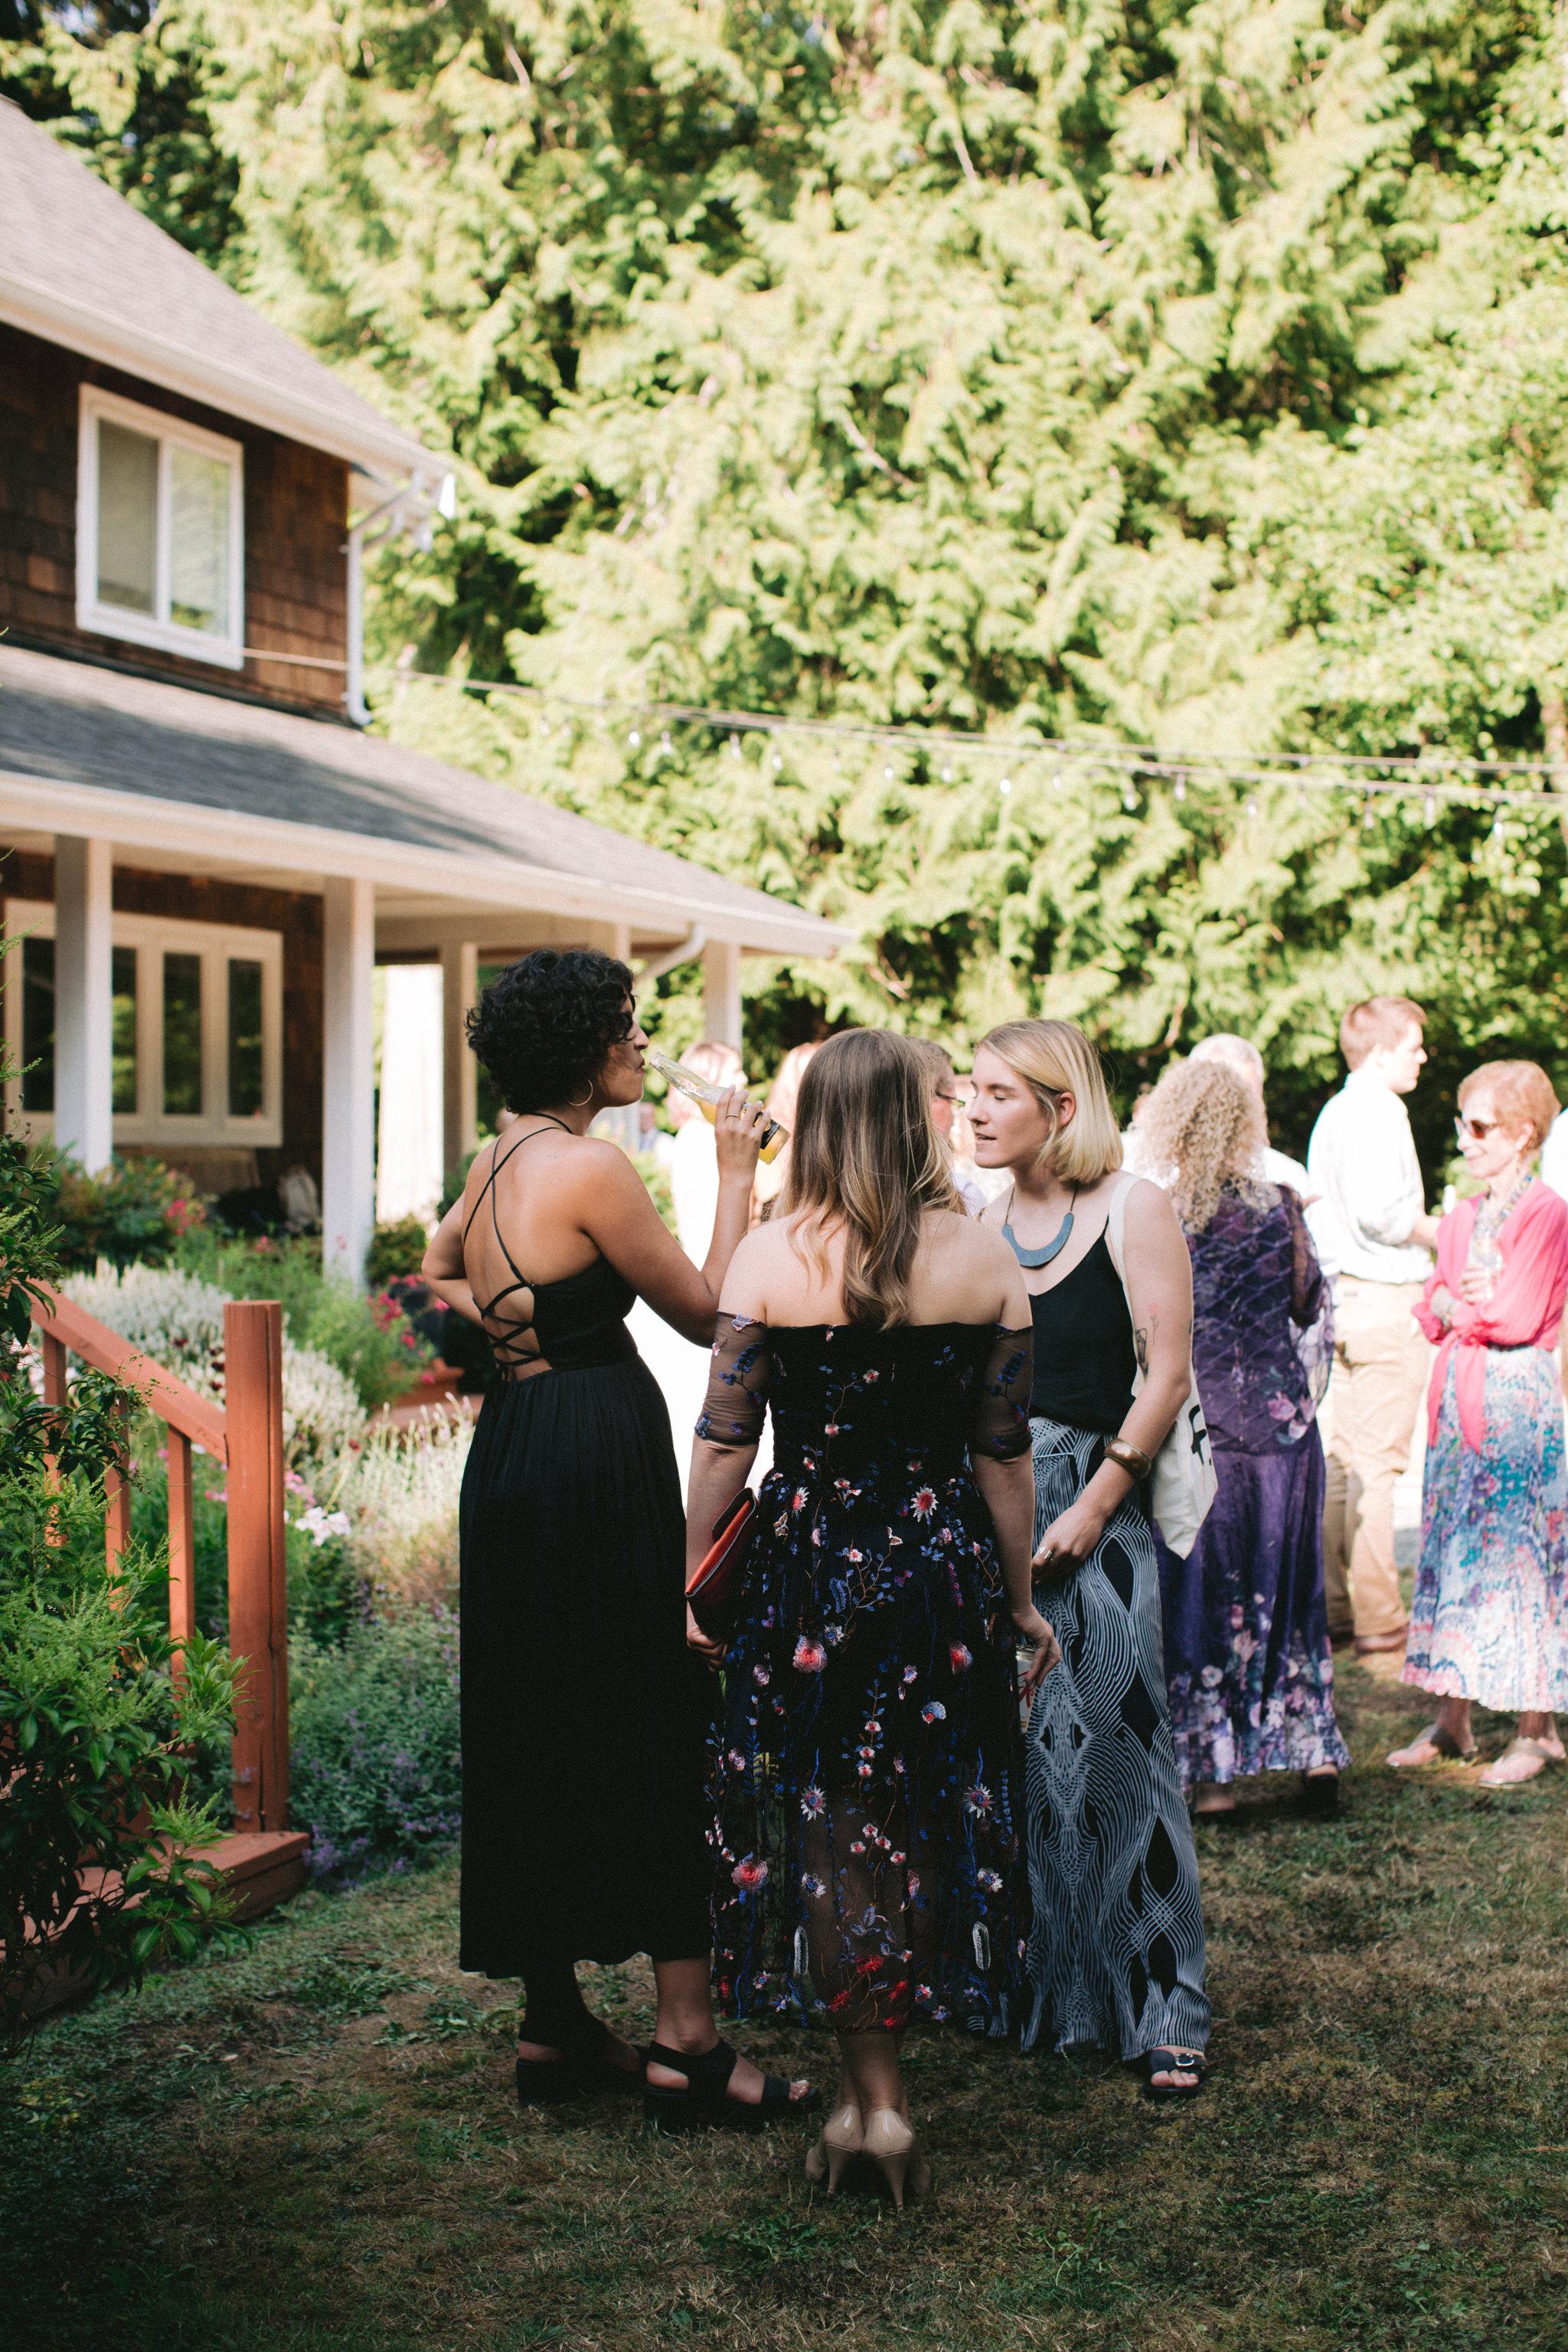 Backyard-Bainbridge-Island-Wedding-Alycia-Lovell-Photography-74.JPG